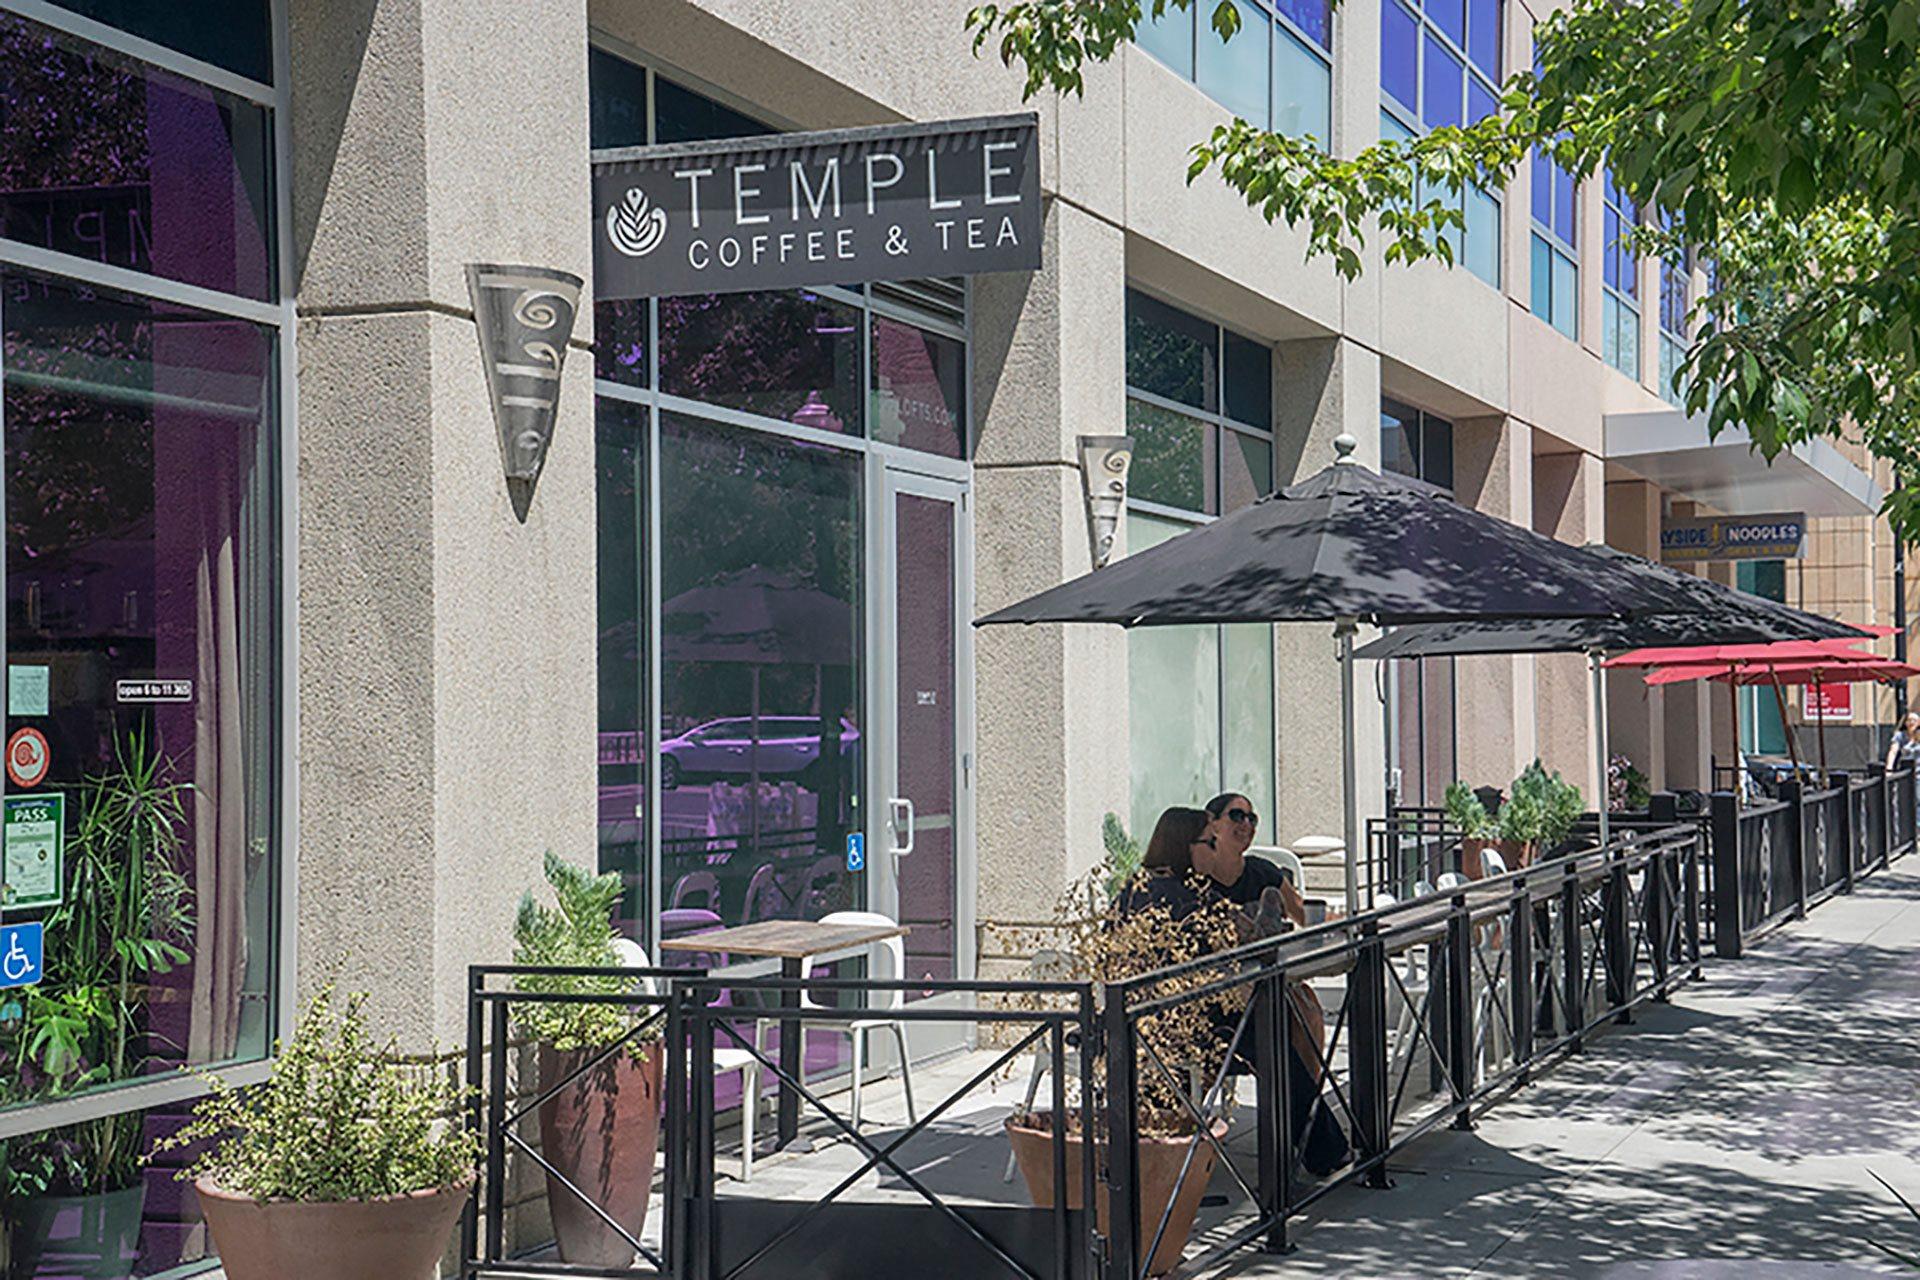 Temple Coffee Shop